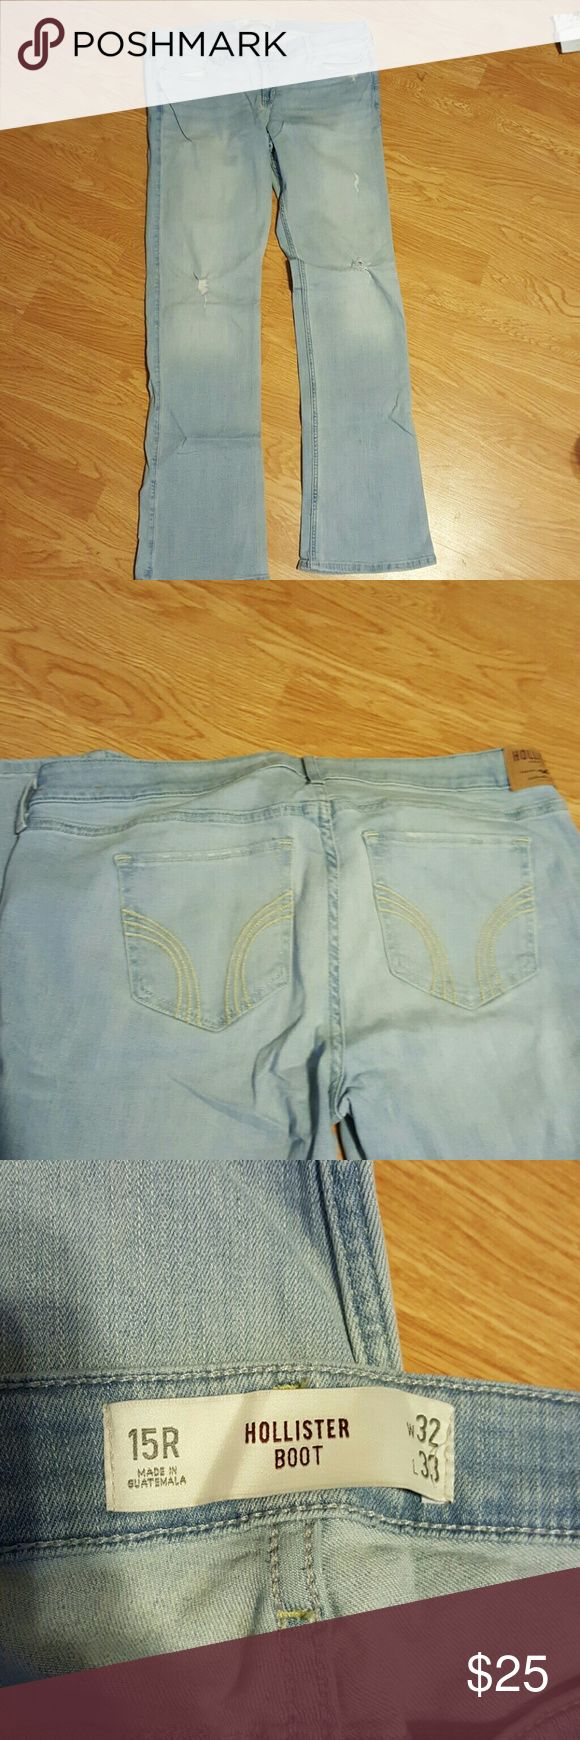 Hollister boot cut jeans size 15R HOLLISTER boot cut jeans size 15R Hollister Jeans Boot Cut